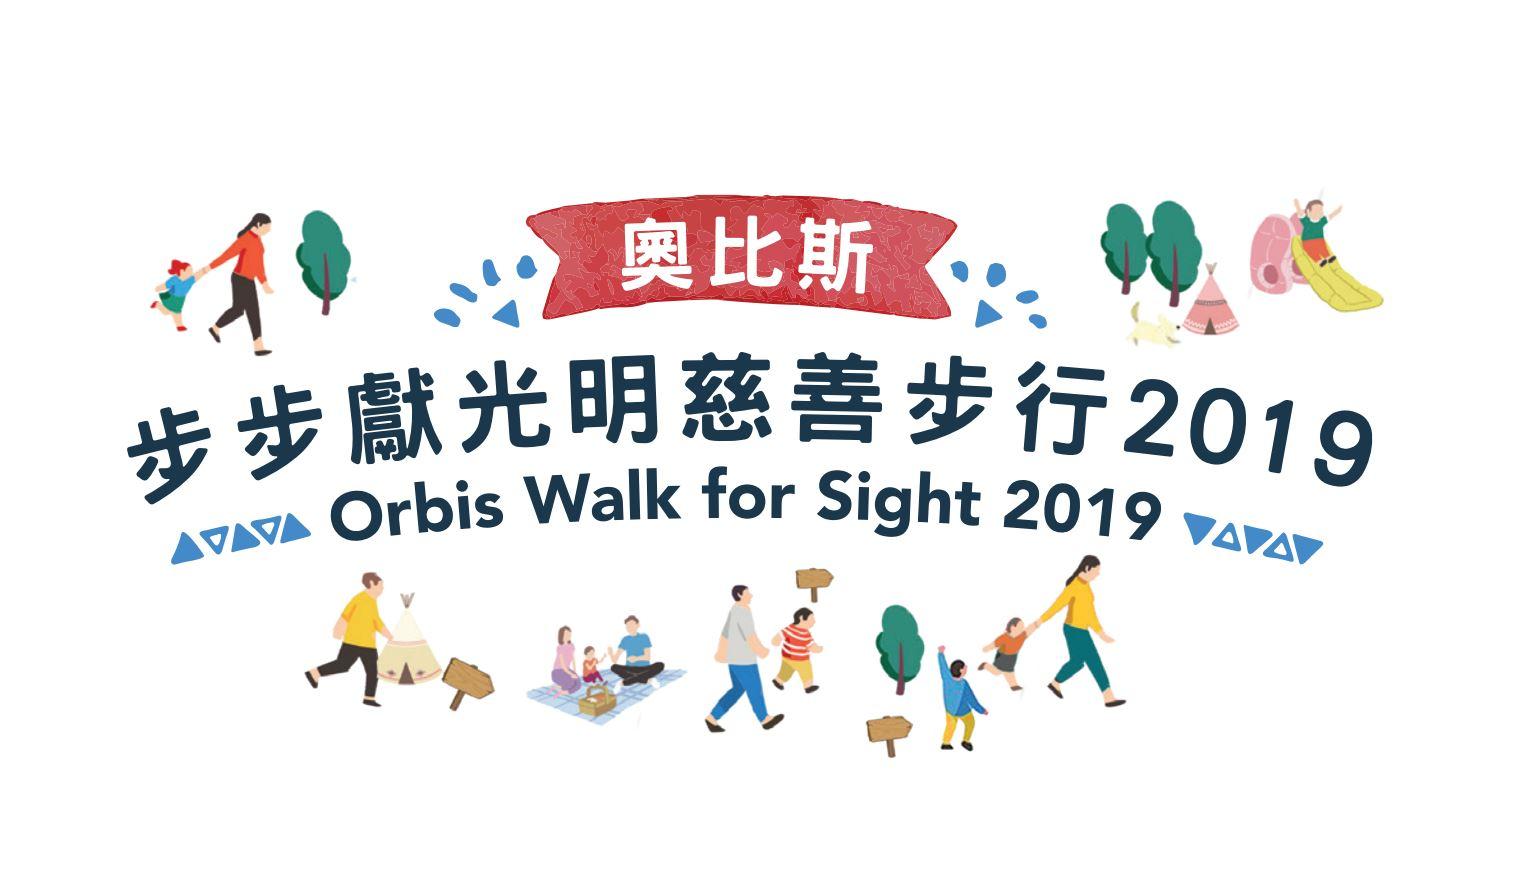 Orbis walk for sight 2019